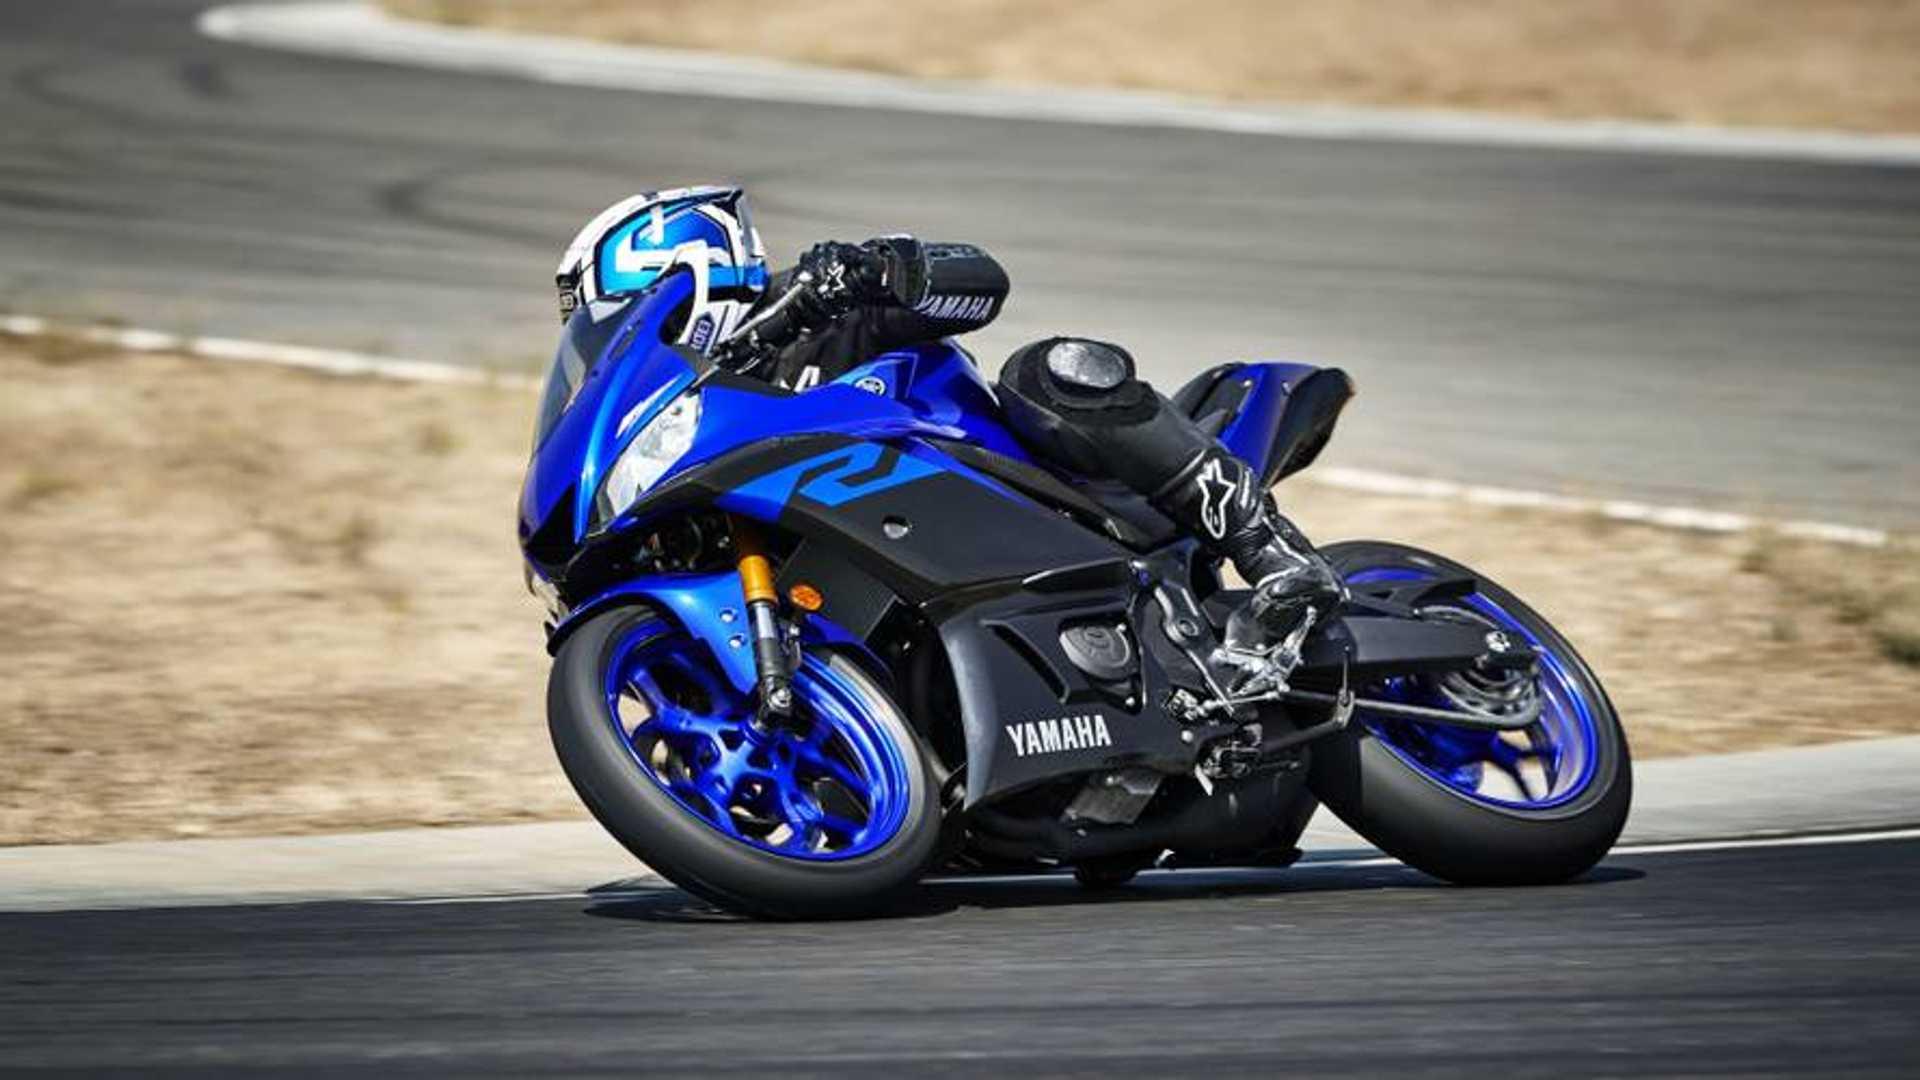 Yamaha S New 2019 Yzf R3 Is Both Radical And Adorable